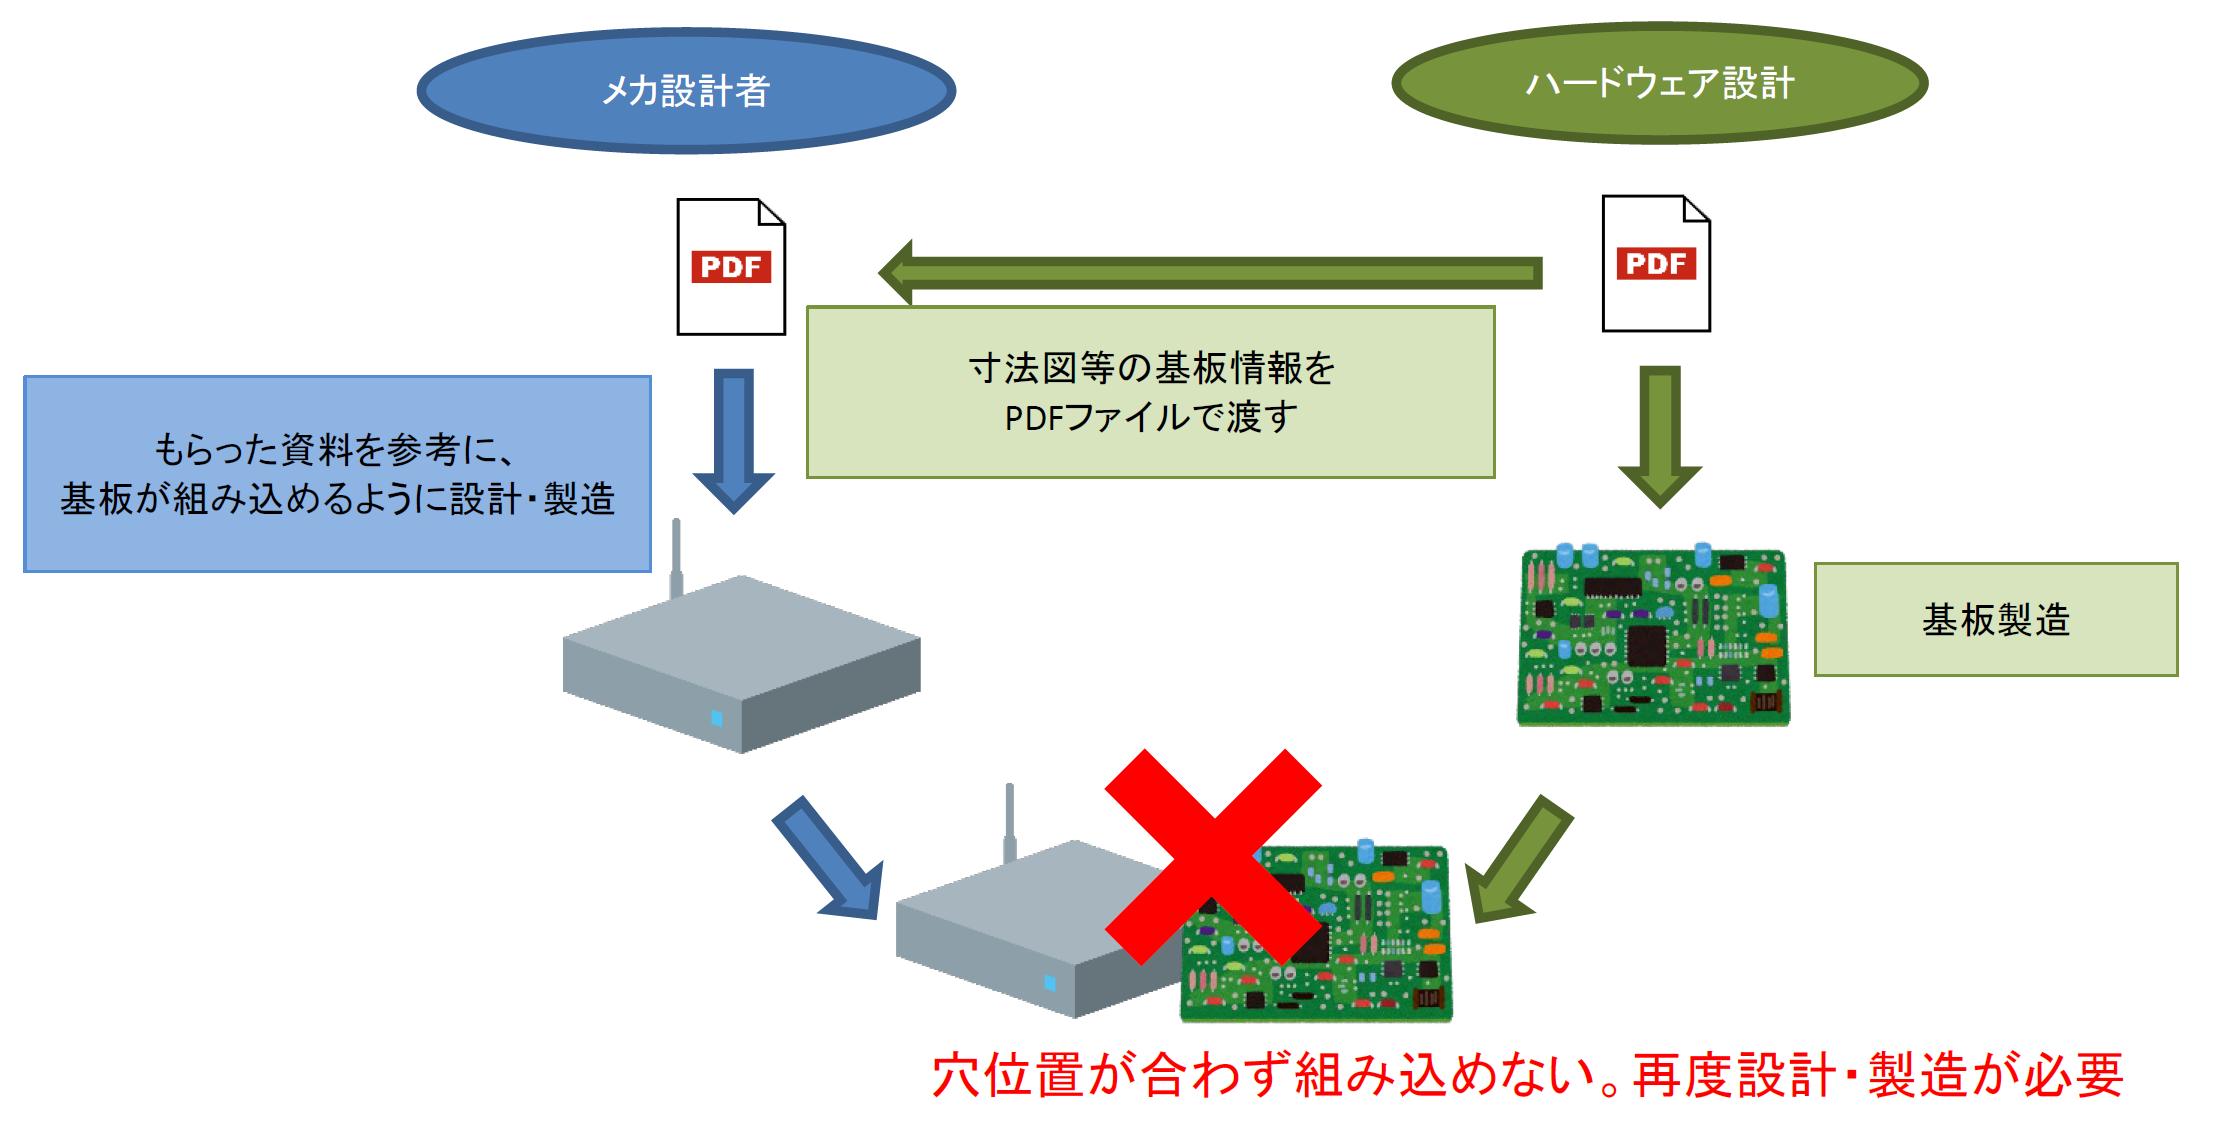 <span>3Dデータの活用によって</span><span>設計者間の認識違いを防止</span>